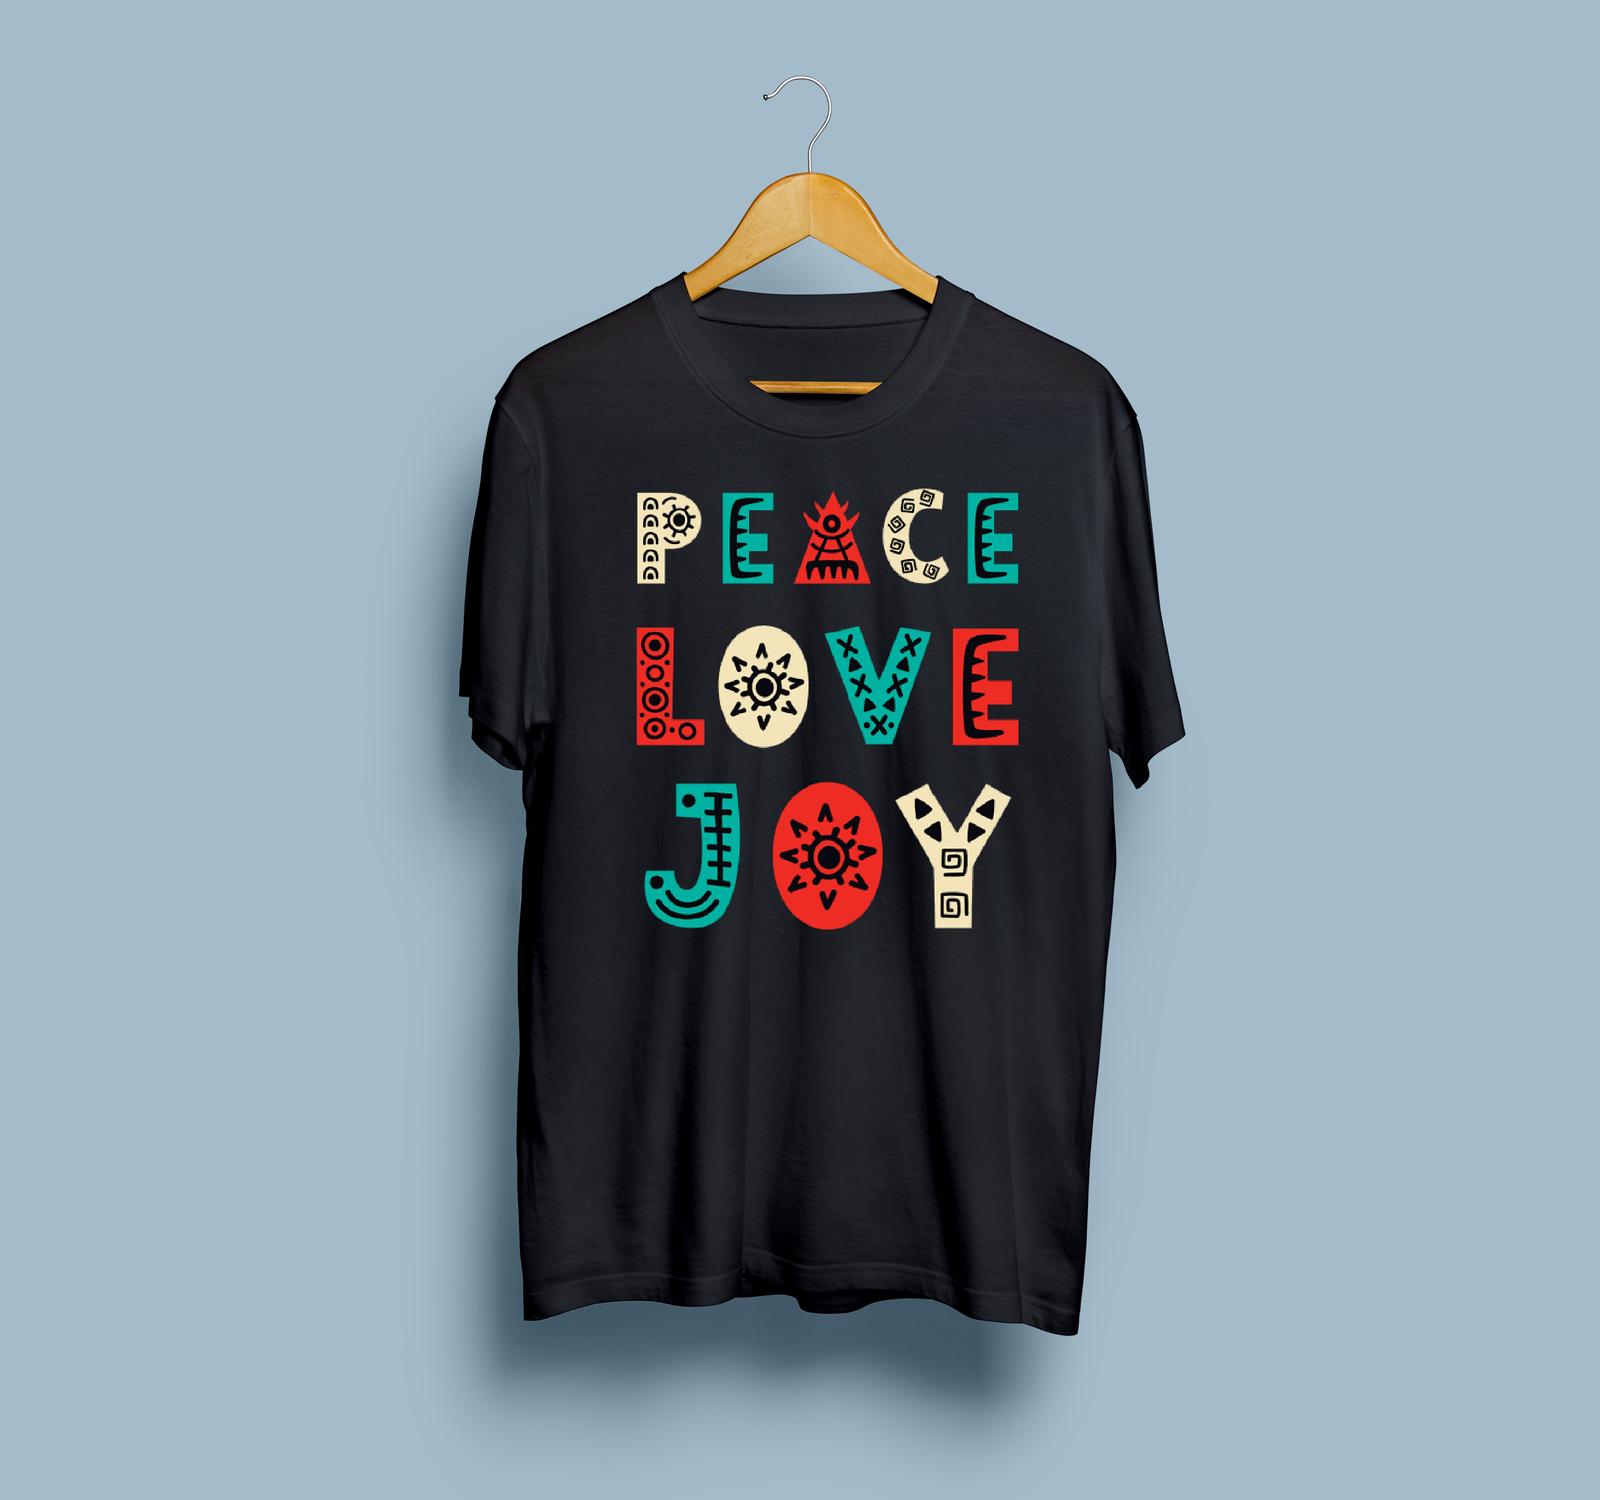 HOT SALE Peace Love Joy Gildan T-Shirt Size S To 2XL Free Shipping